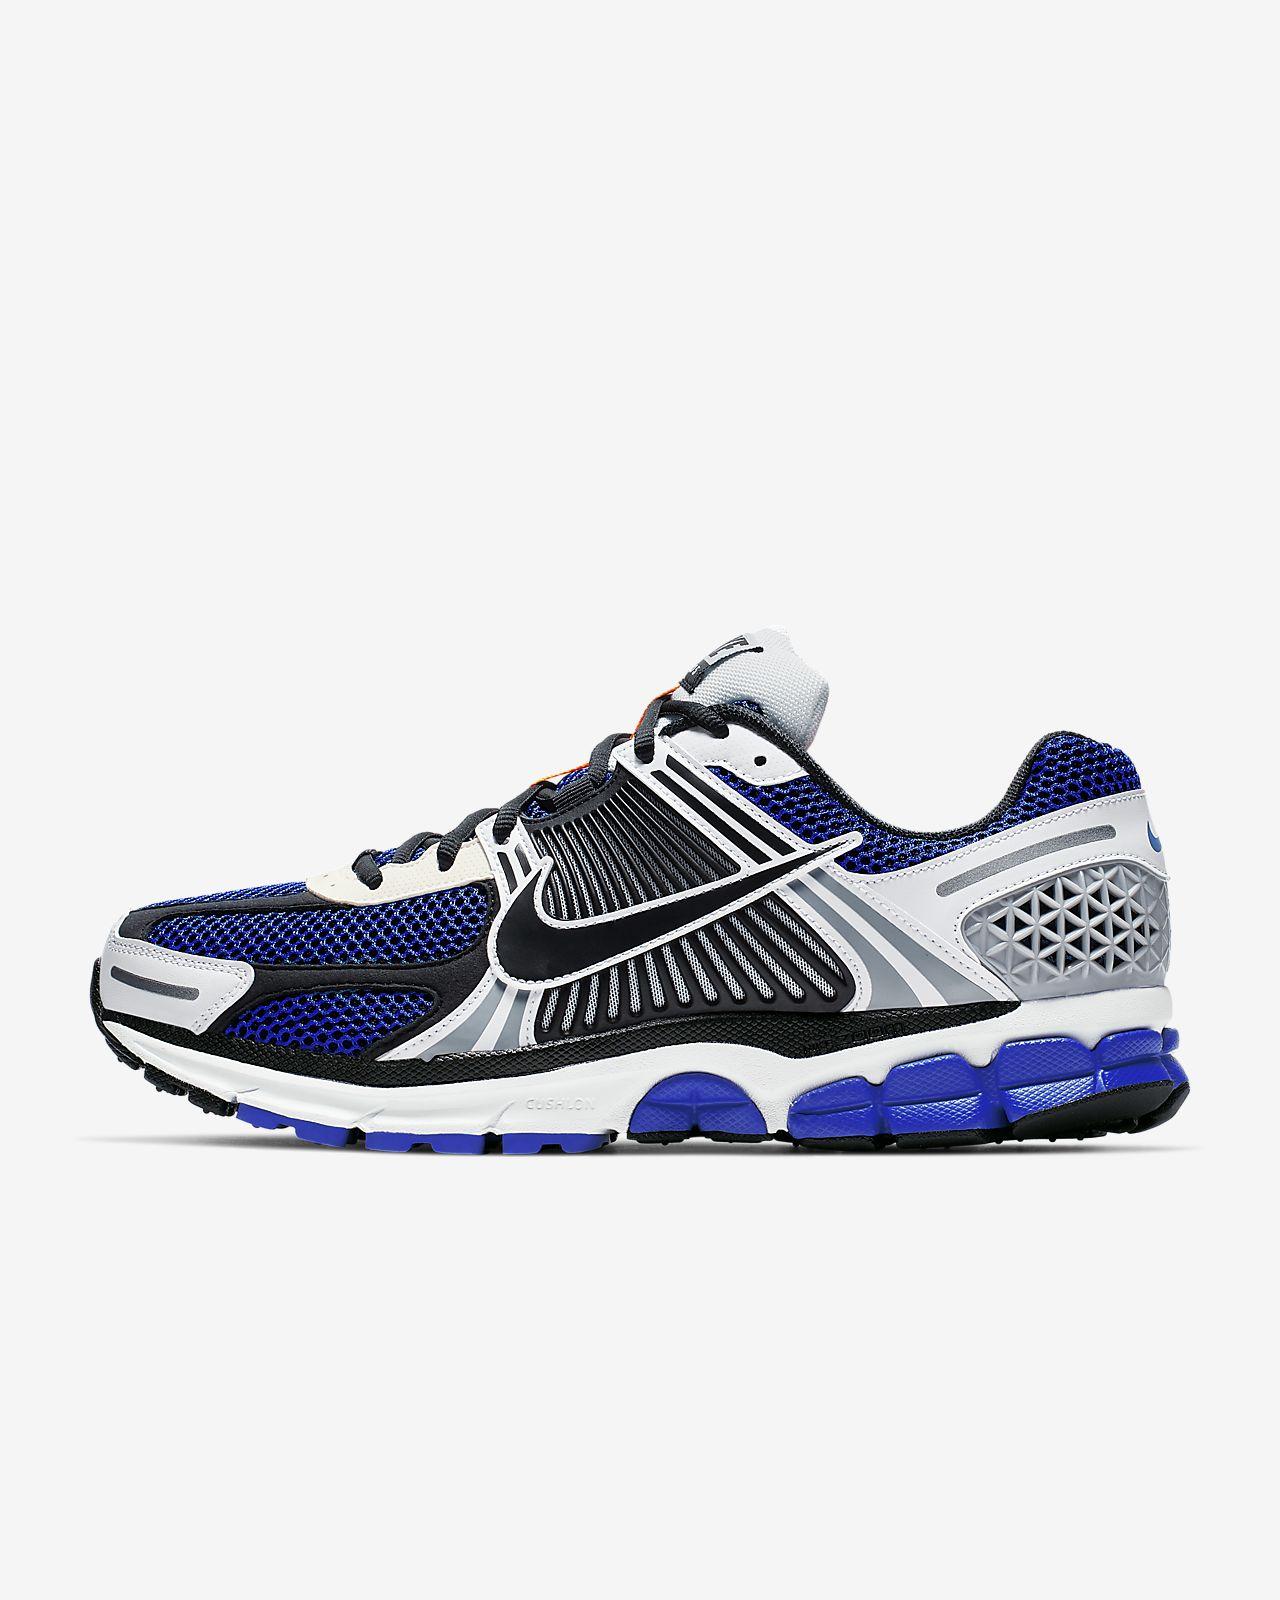 0f09c325de77 Nike Zoom Vomero 5 SE SP Men s Shoe. Nike.com